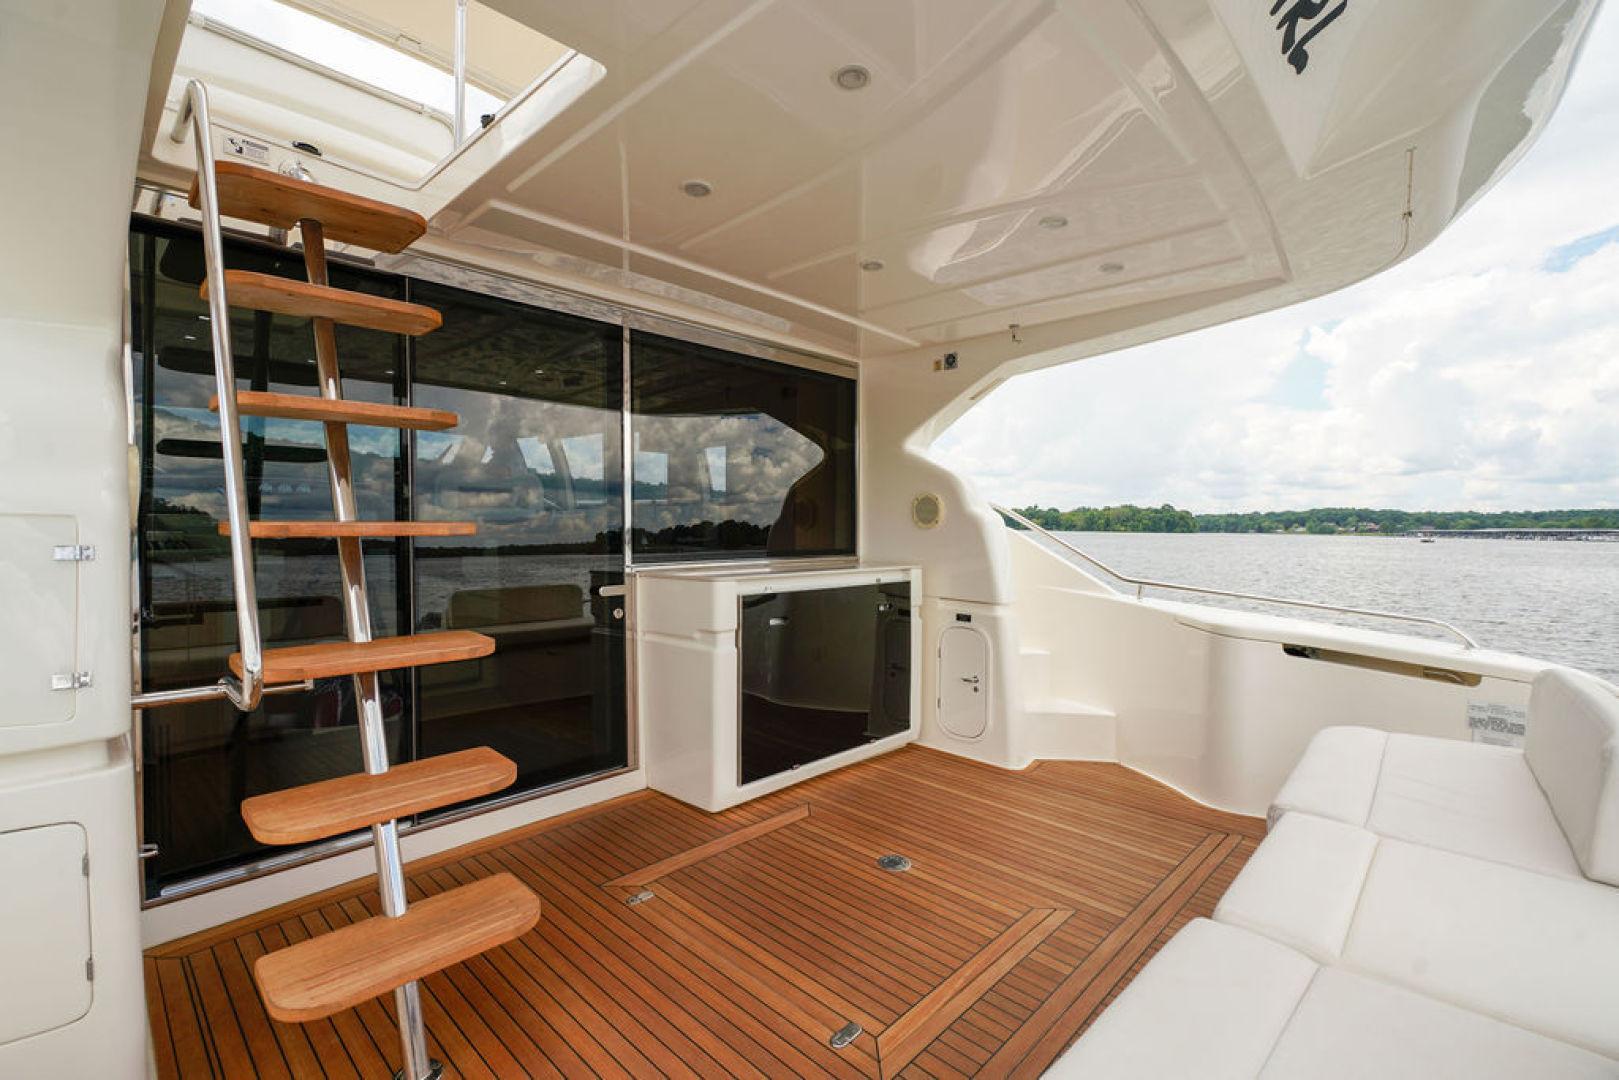 Ferretti Yachts-530 2013-ISLAND GIRL Mount Juliet-Tennessee-United States-1574688   Thumbnail